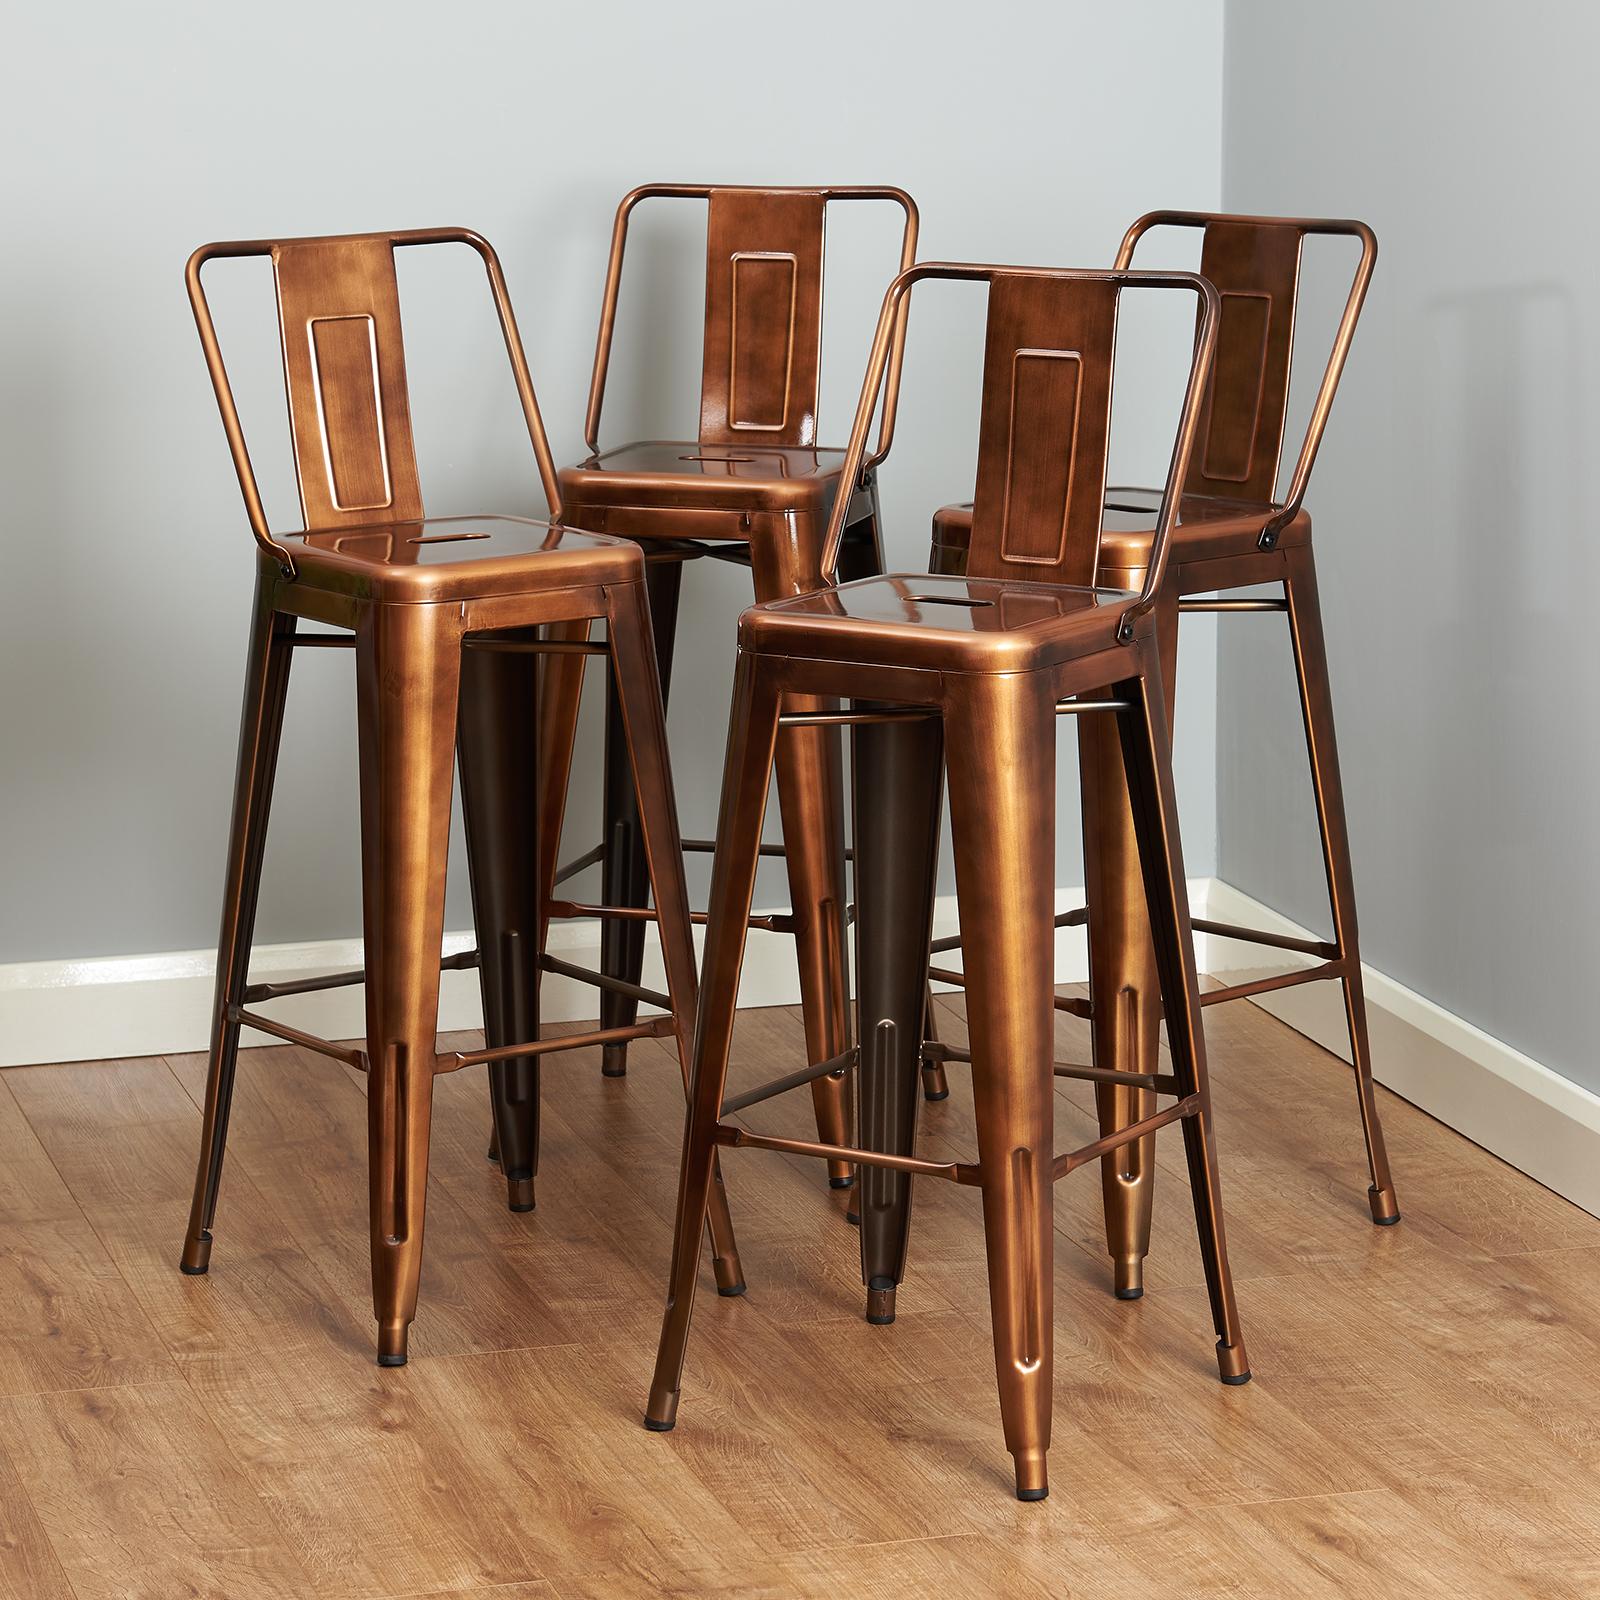 Copper Metal Breakfast Bar Cafe Stool Industrial Retro